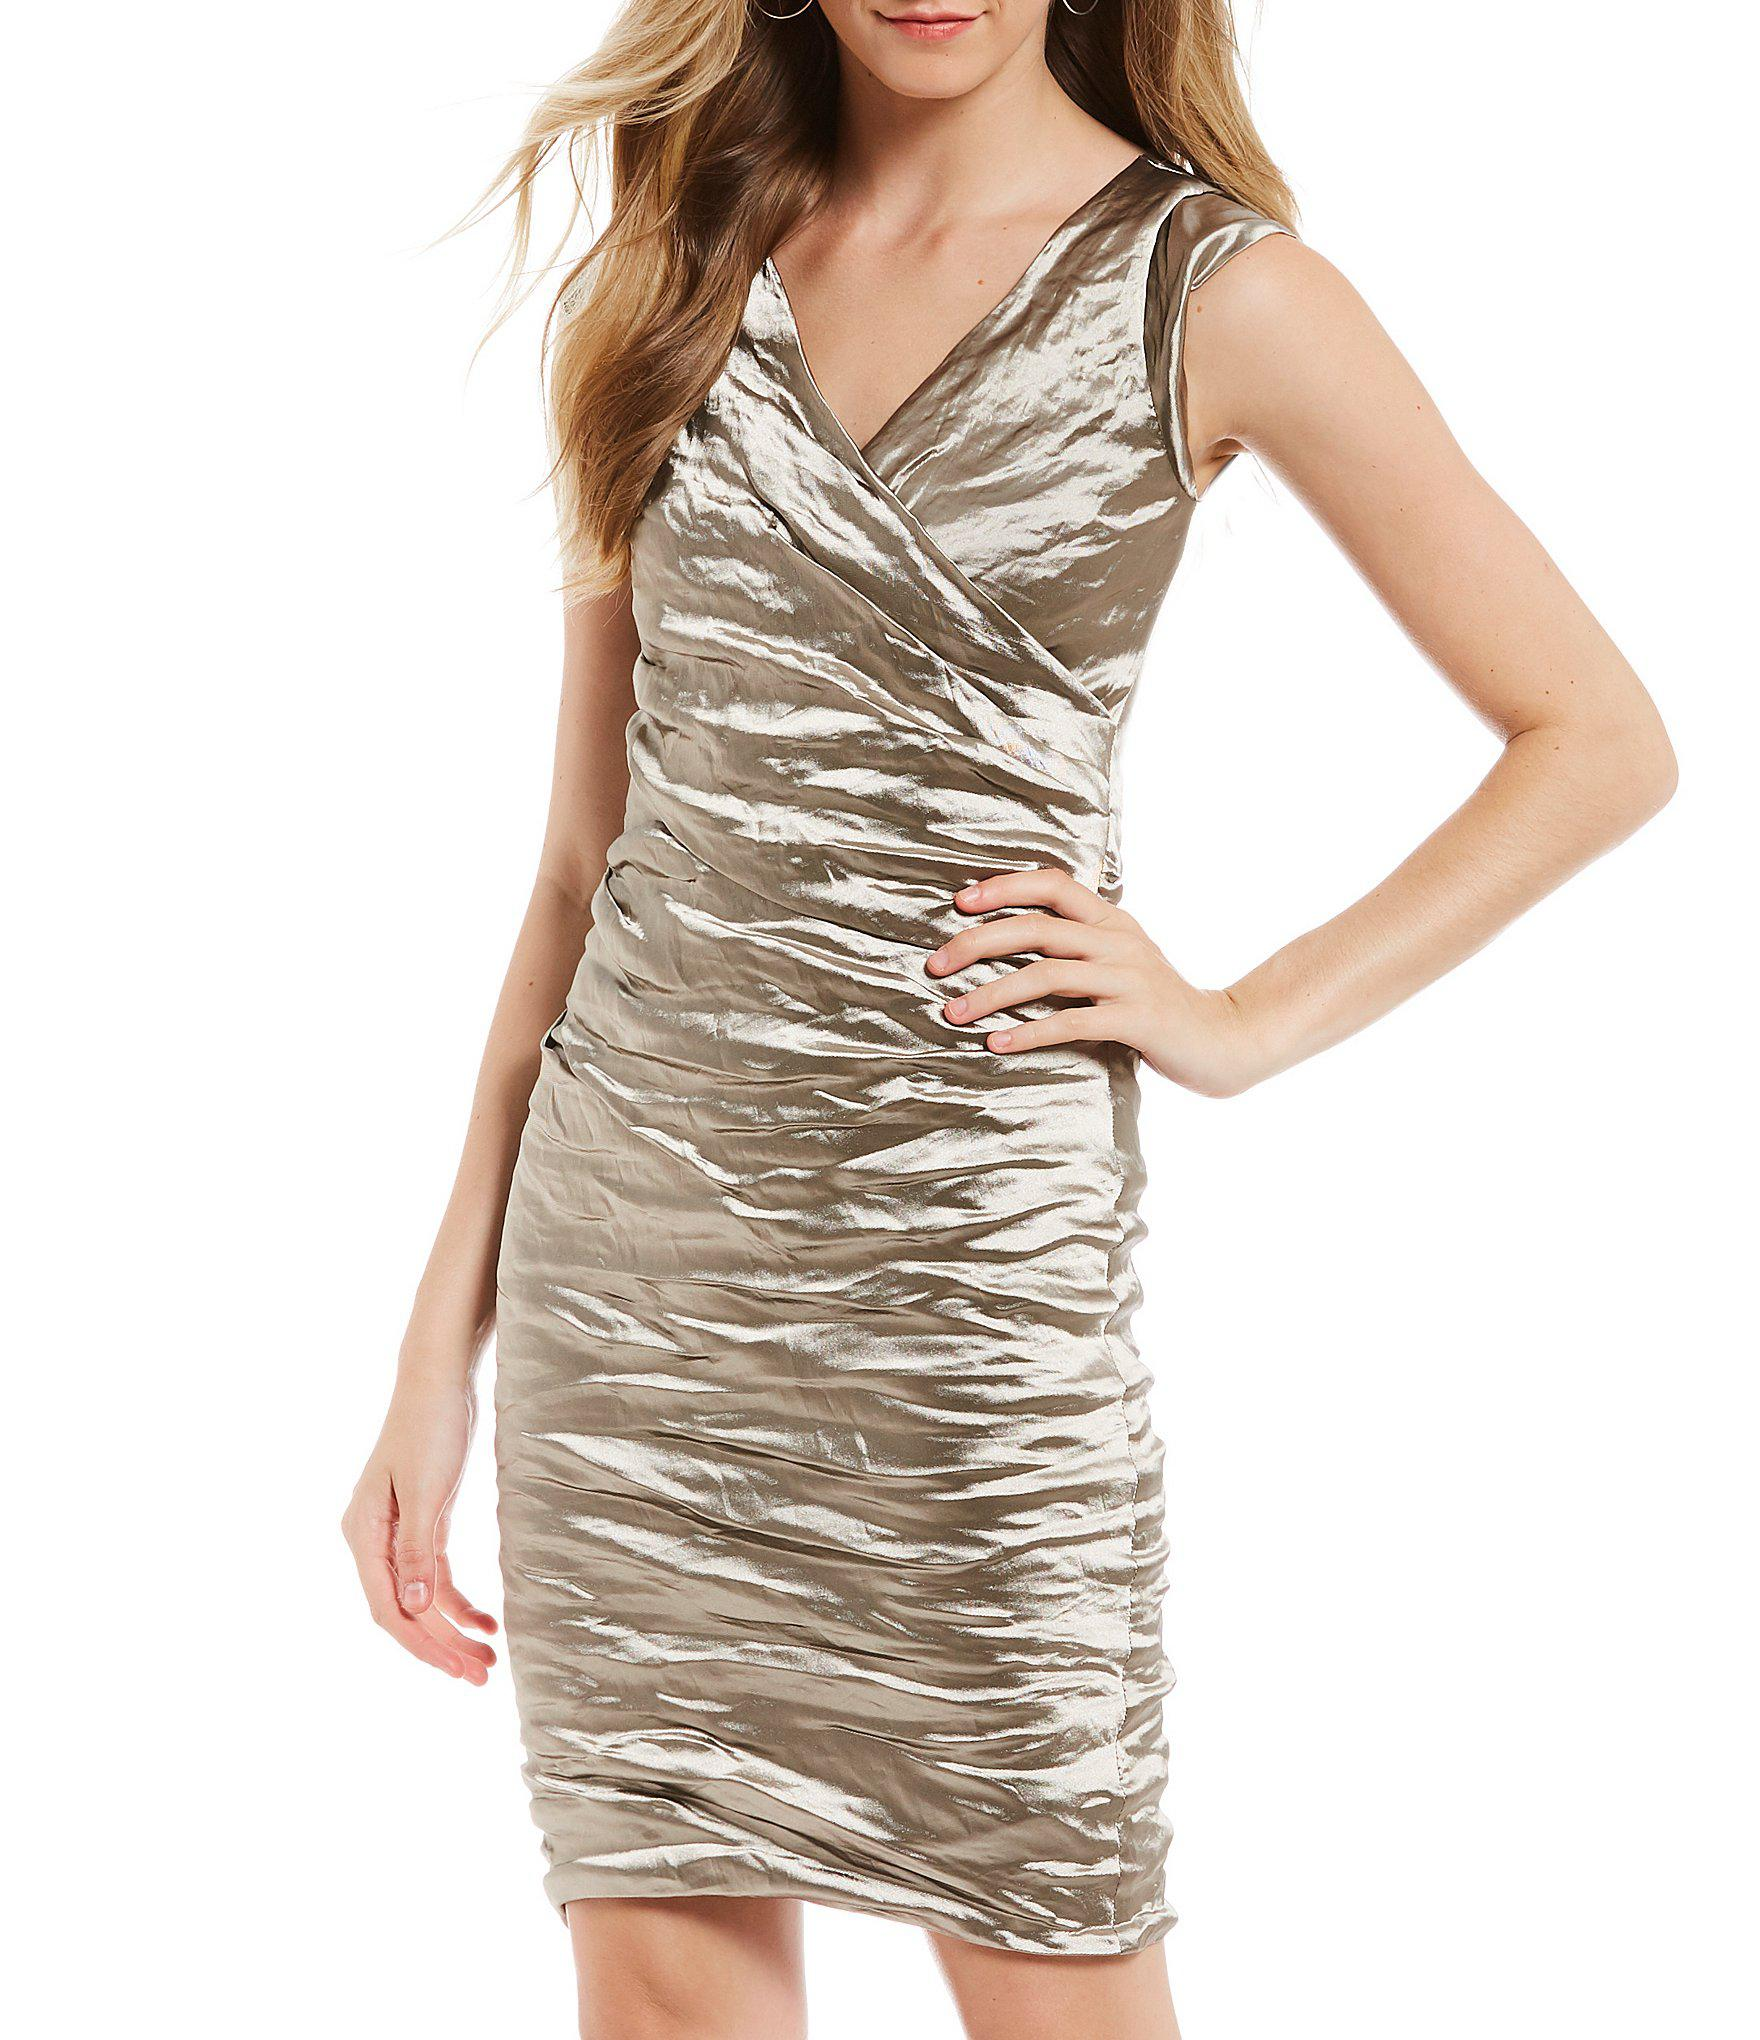 45bf2047 Lyst - Nicole Miller Artelier Beckett Techno Metal Sheath Dress